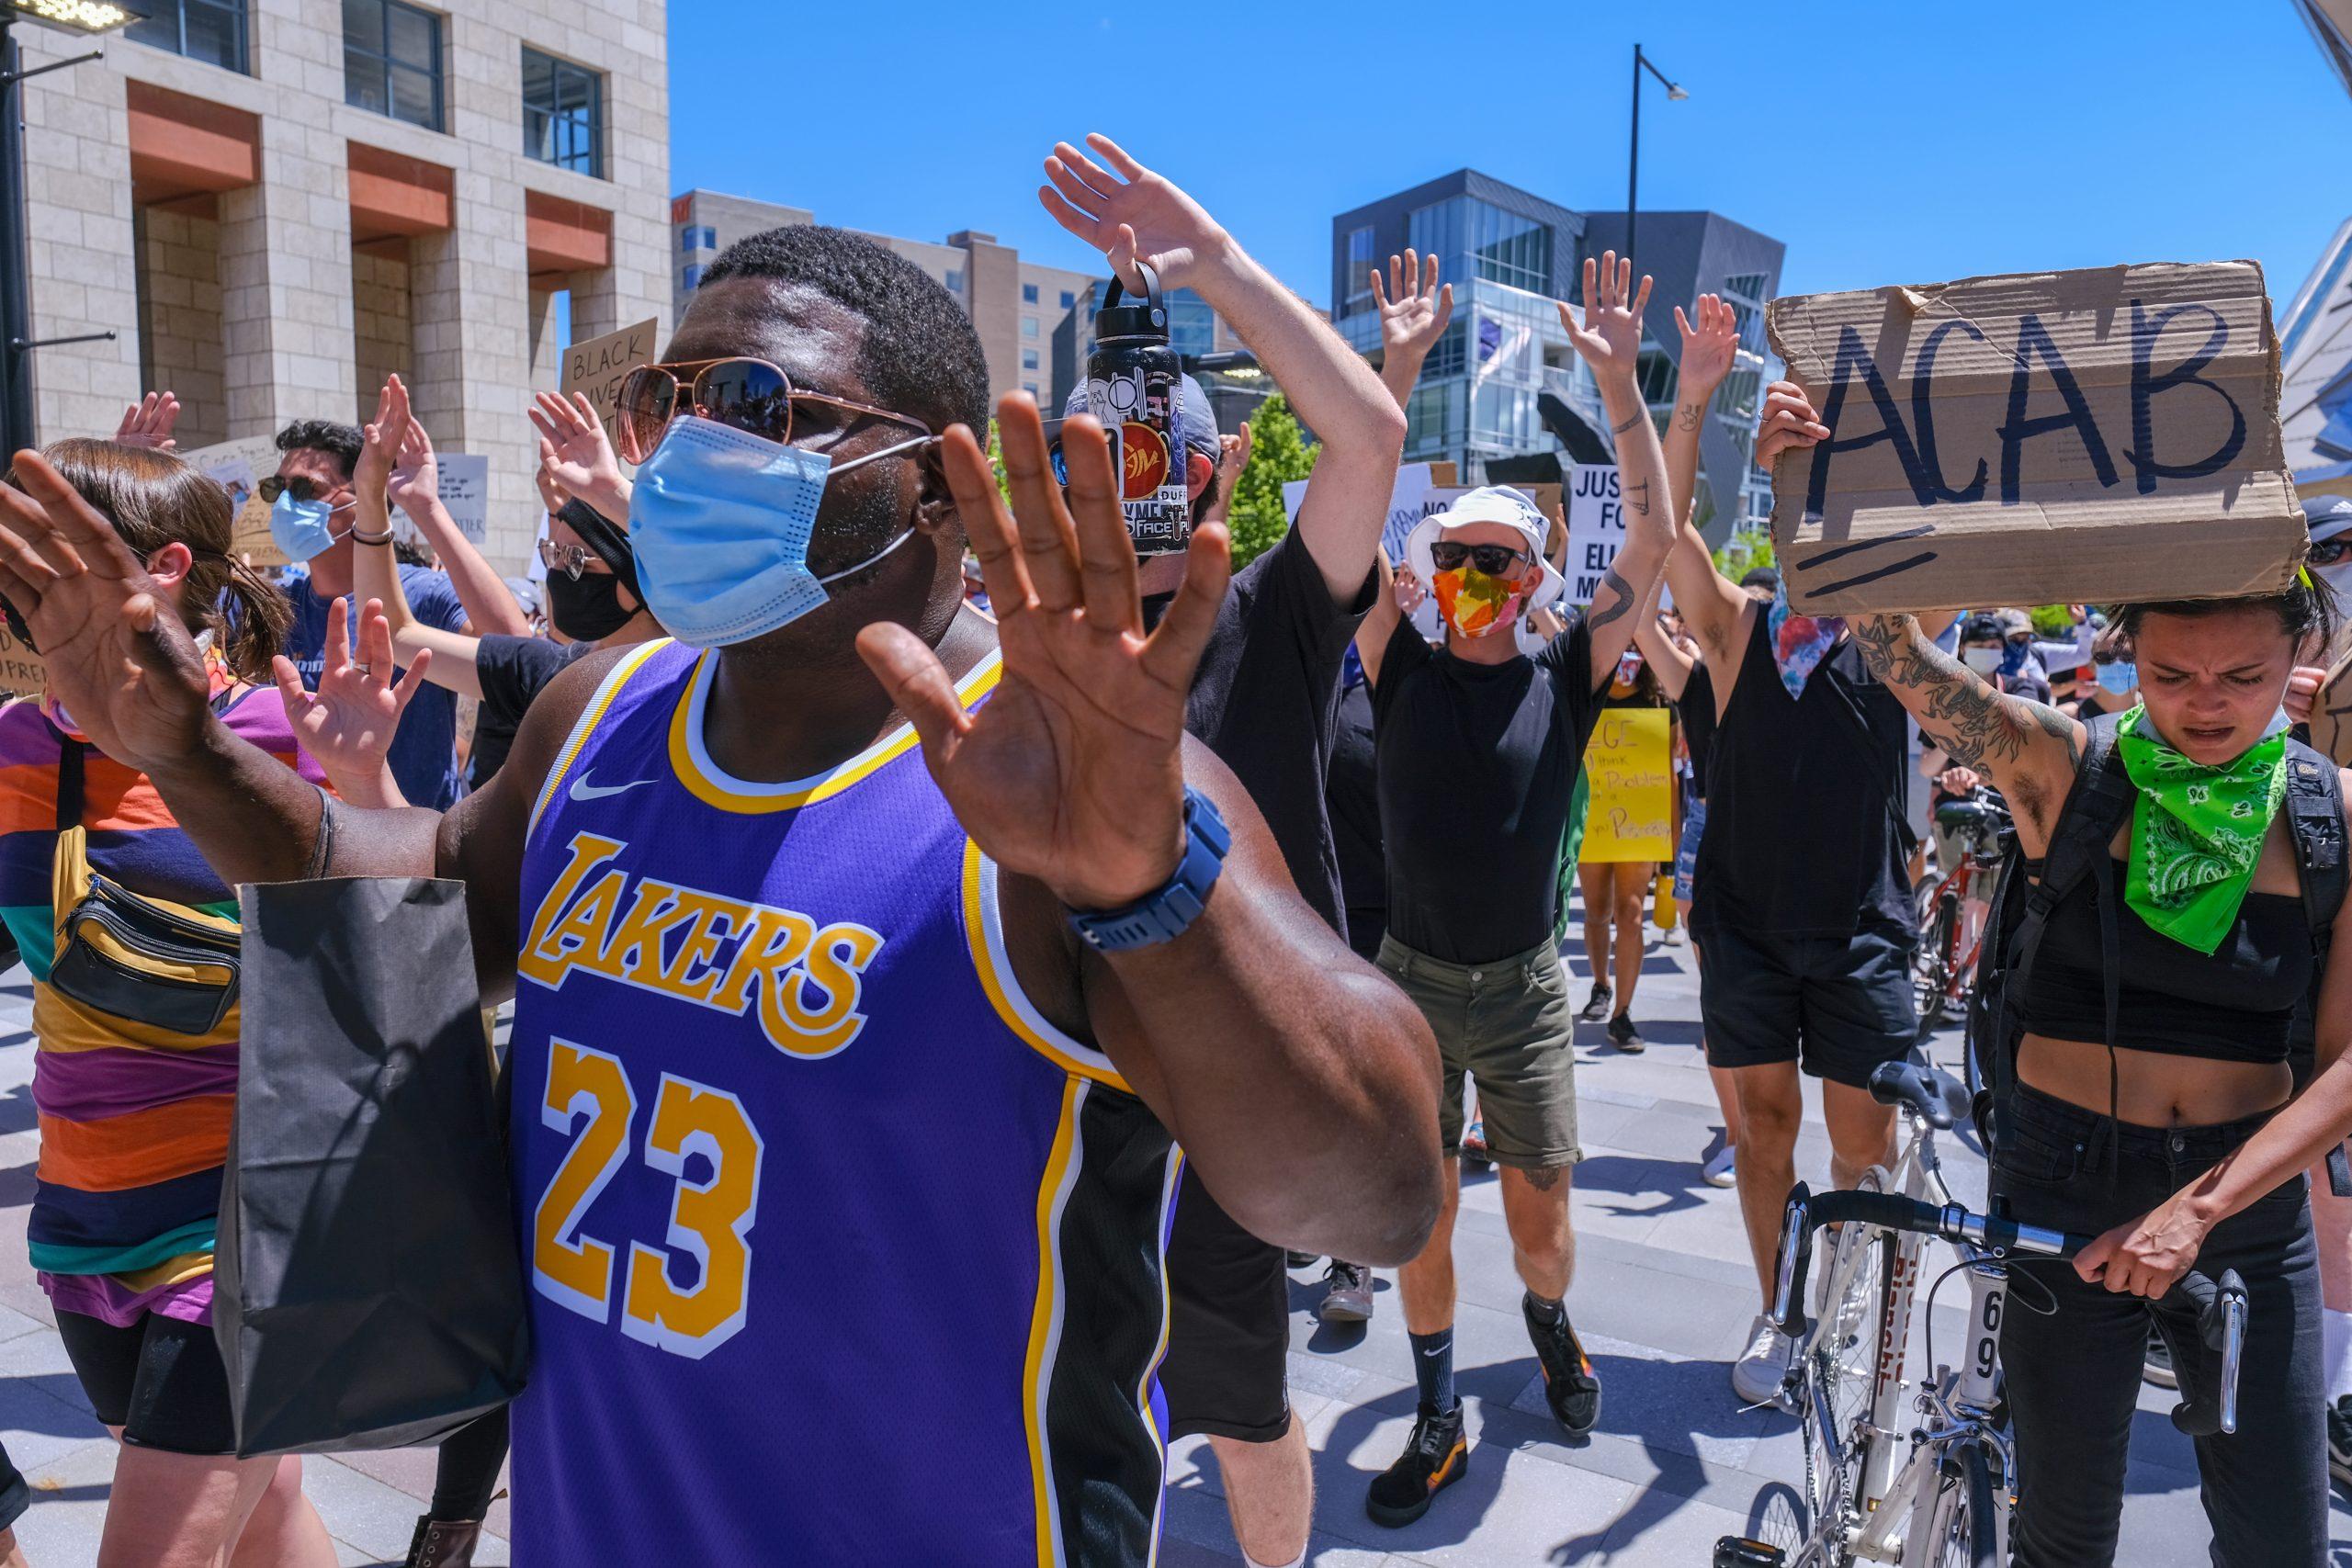 Updates: Denver protests in honor of George Floyd